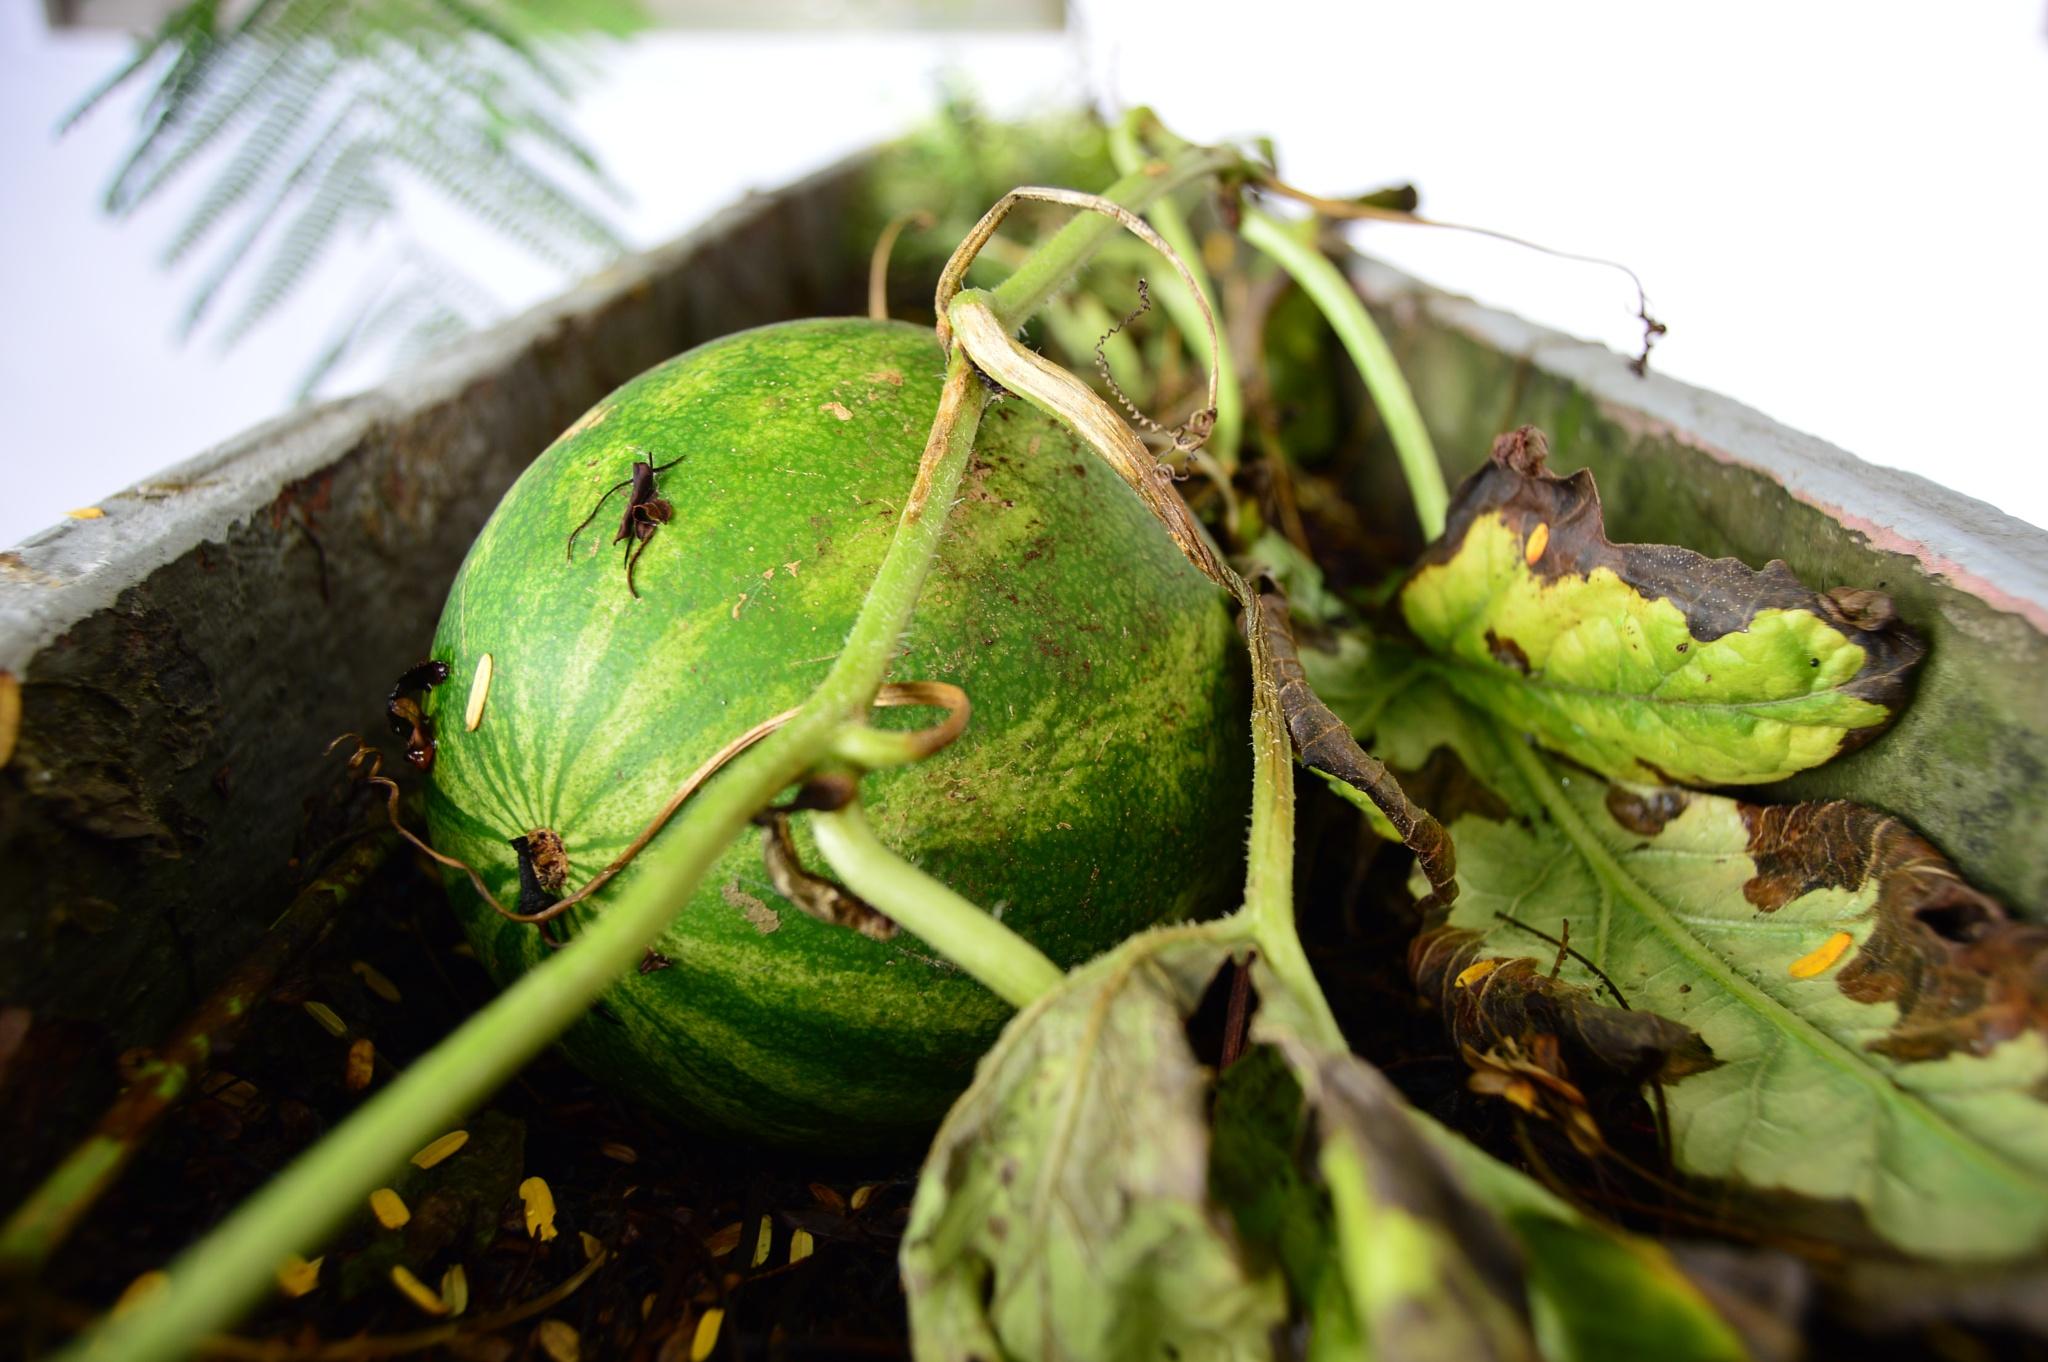 watermelon baby by gaelgarcia38